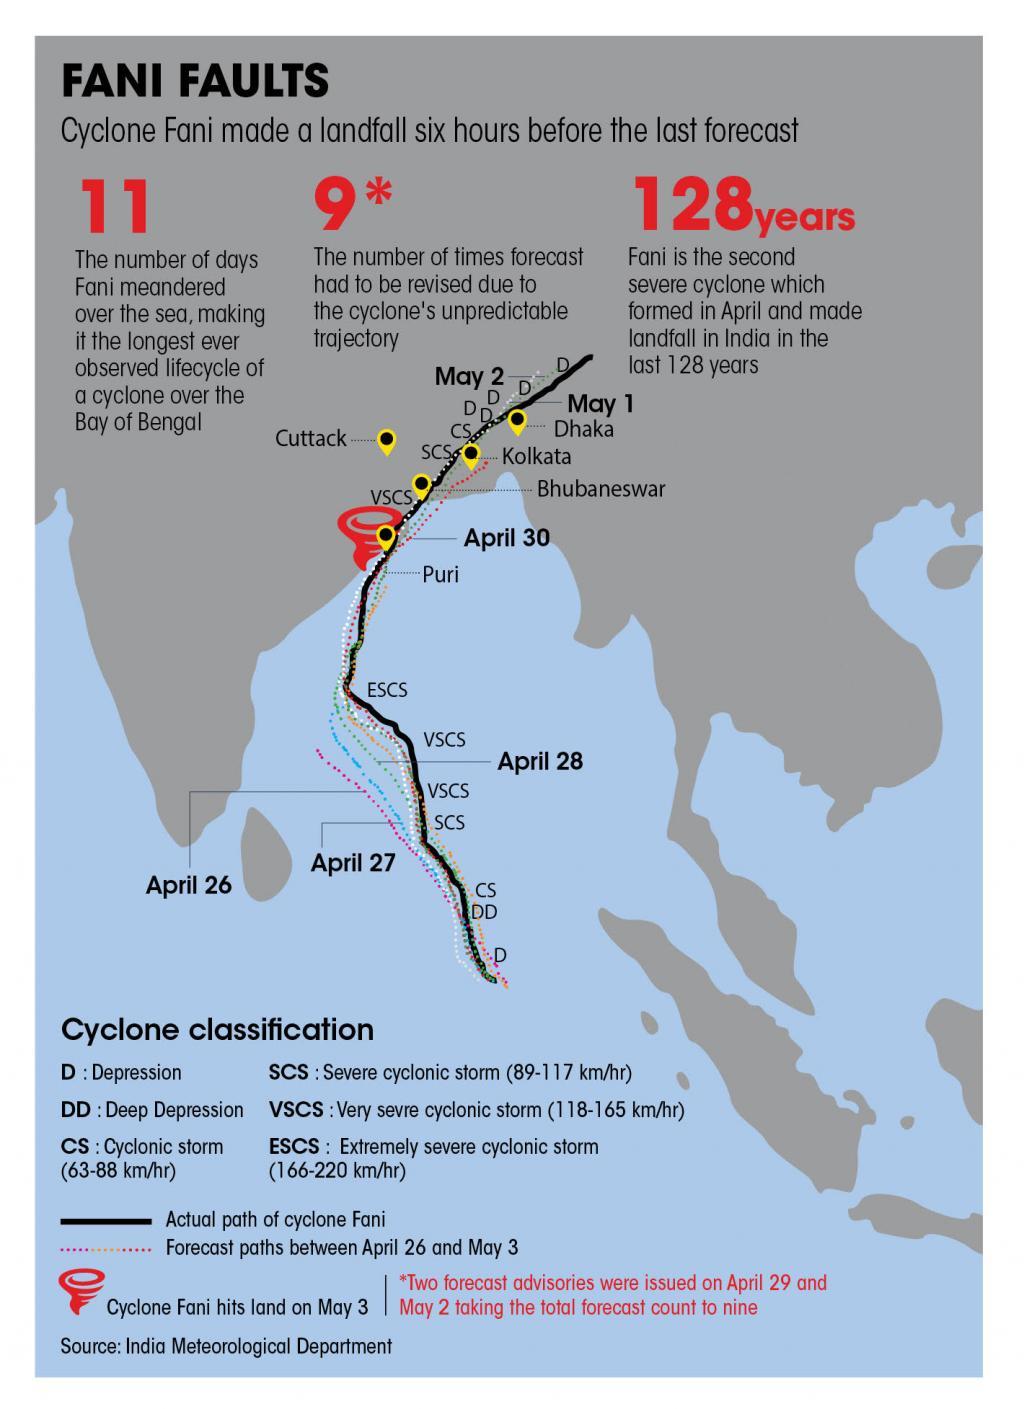 Cyclone Fani made landfall six hours before the last forecast